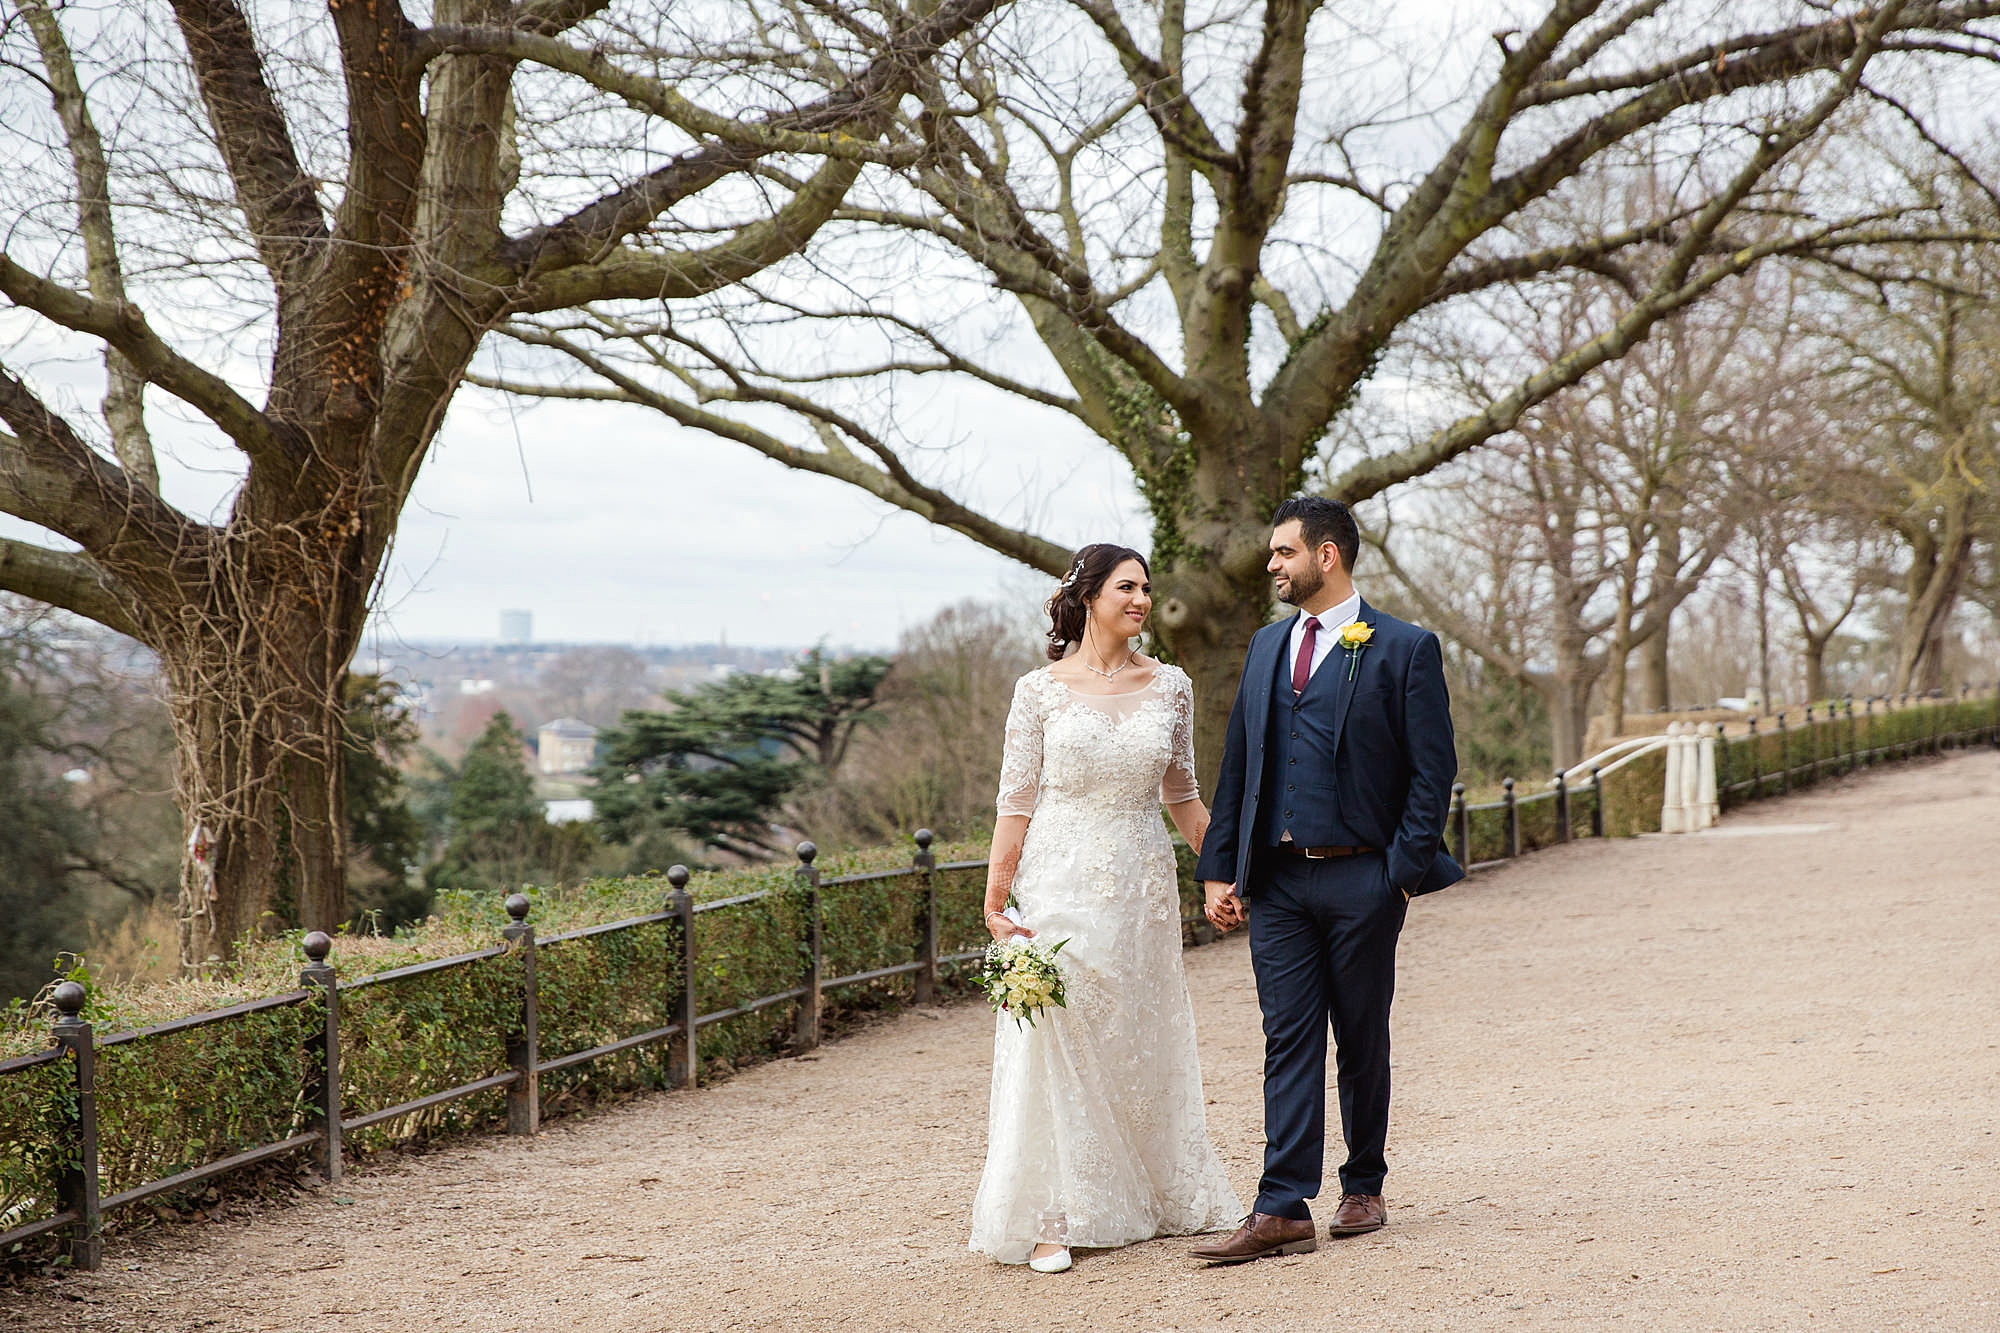 Richmond Hill Hotel wedding bride and groom walking on terrace